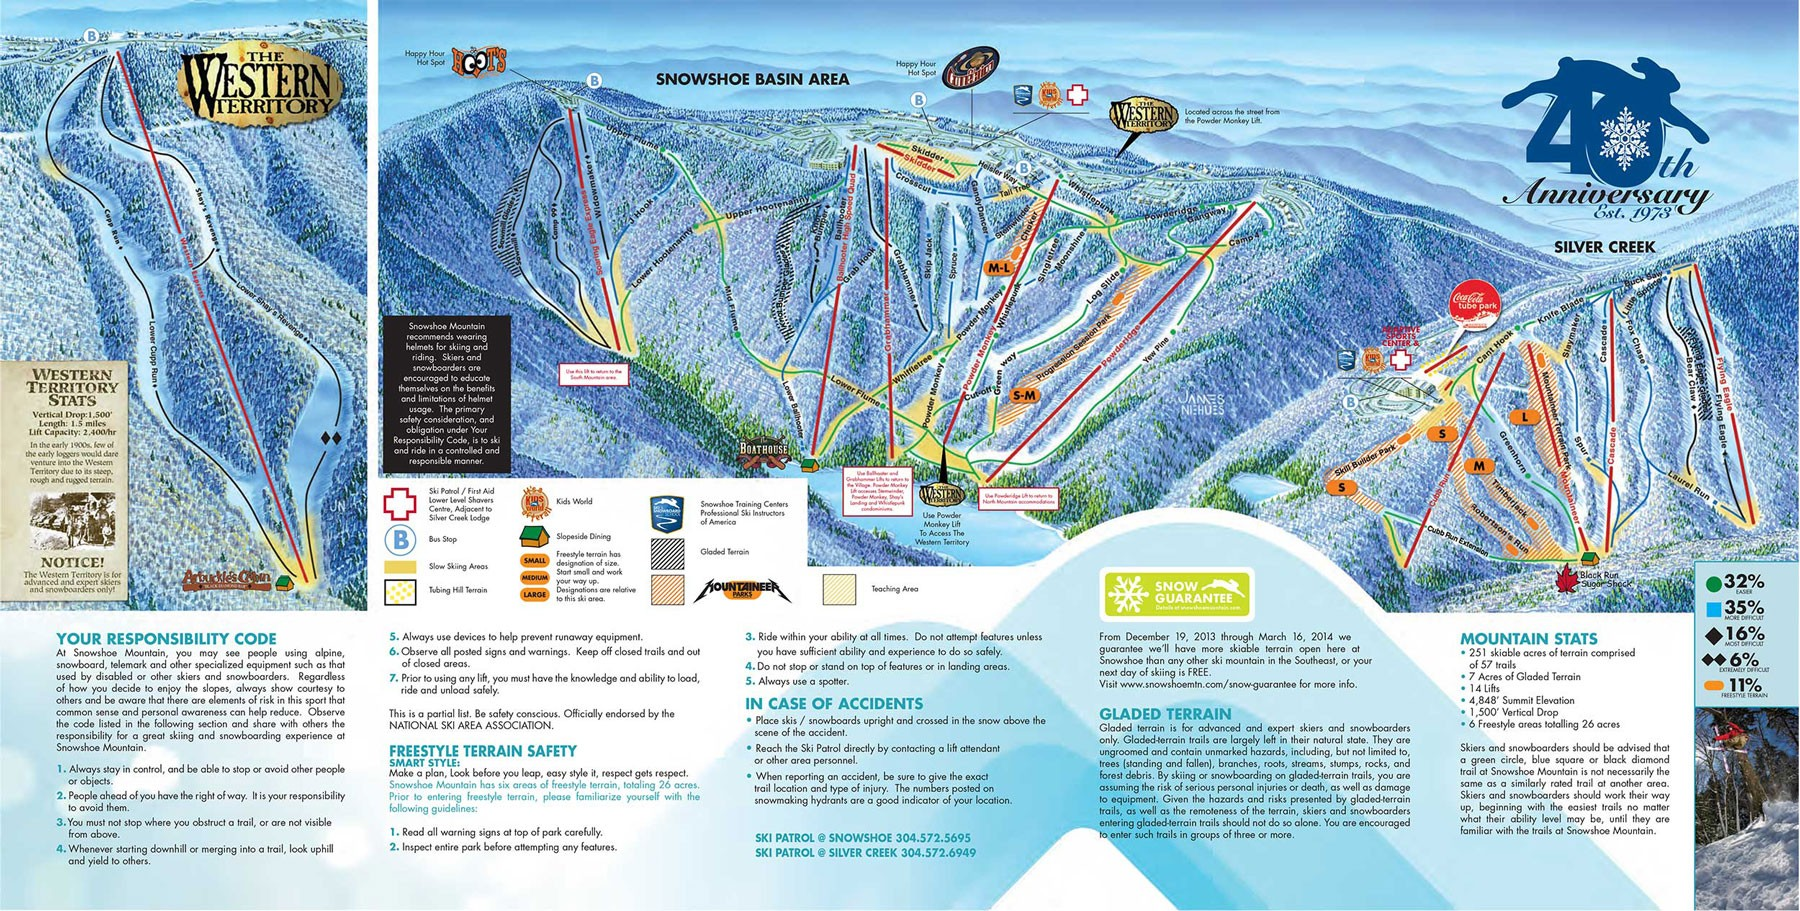 Snowshoe Resort Wv Auto Electrical Wiring Diagram 1734 Ow4 Mountain Ski Annual Snowfall